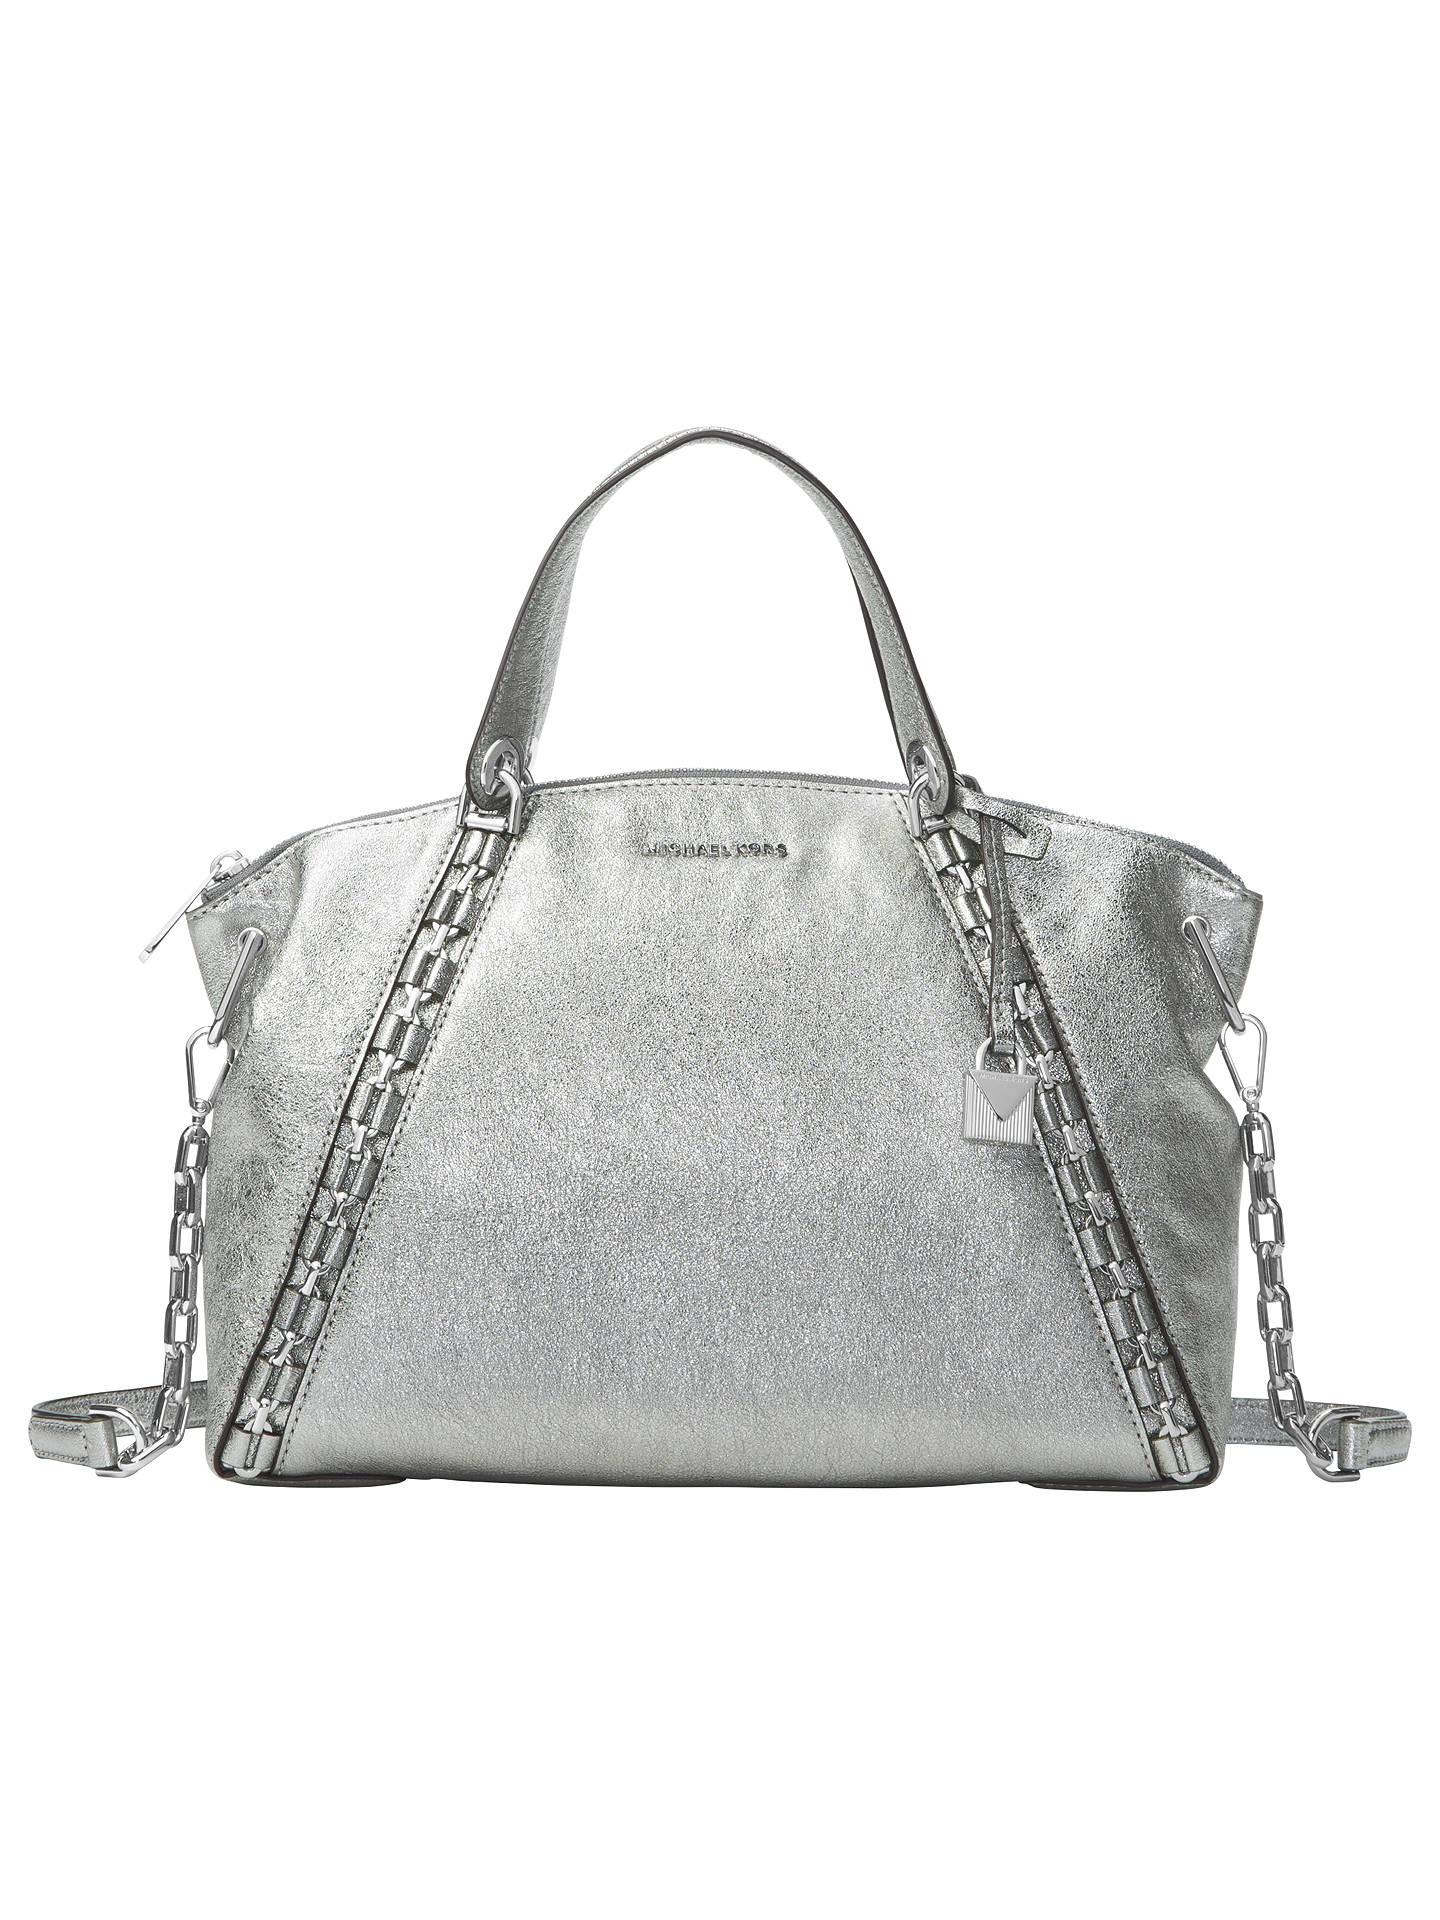 a9416ba86591 Buy MICHAEL Michael Kors Sadie Large Leather Satchel Bag, Light Pewter  Online at johnlewis.